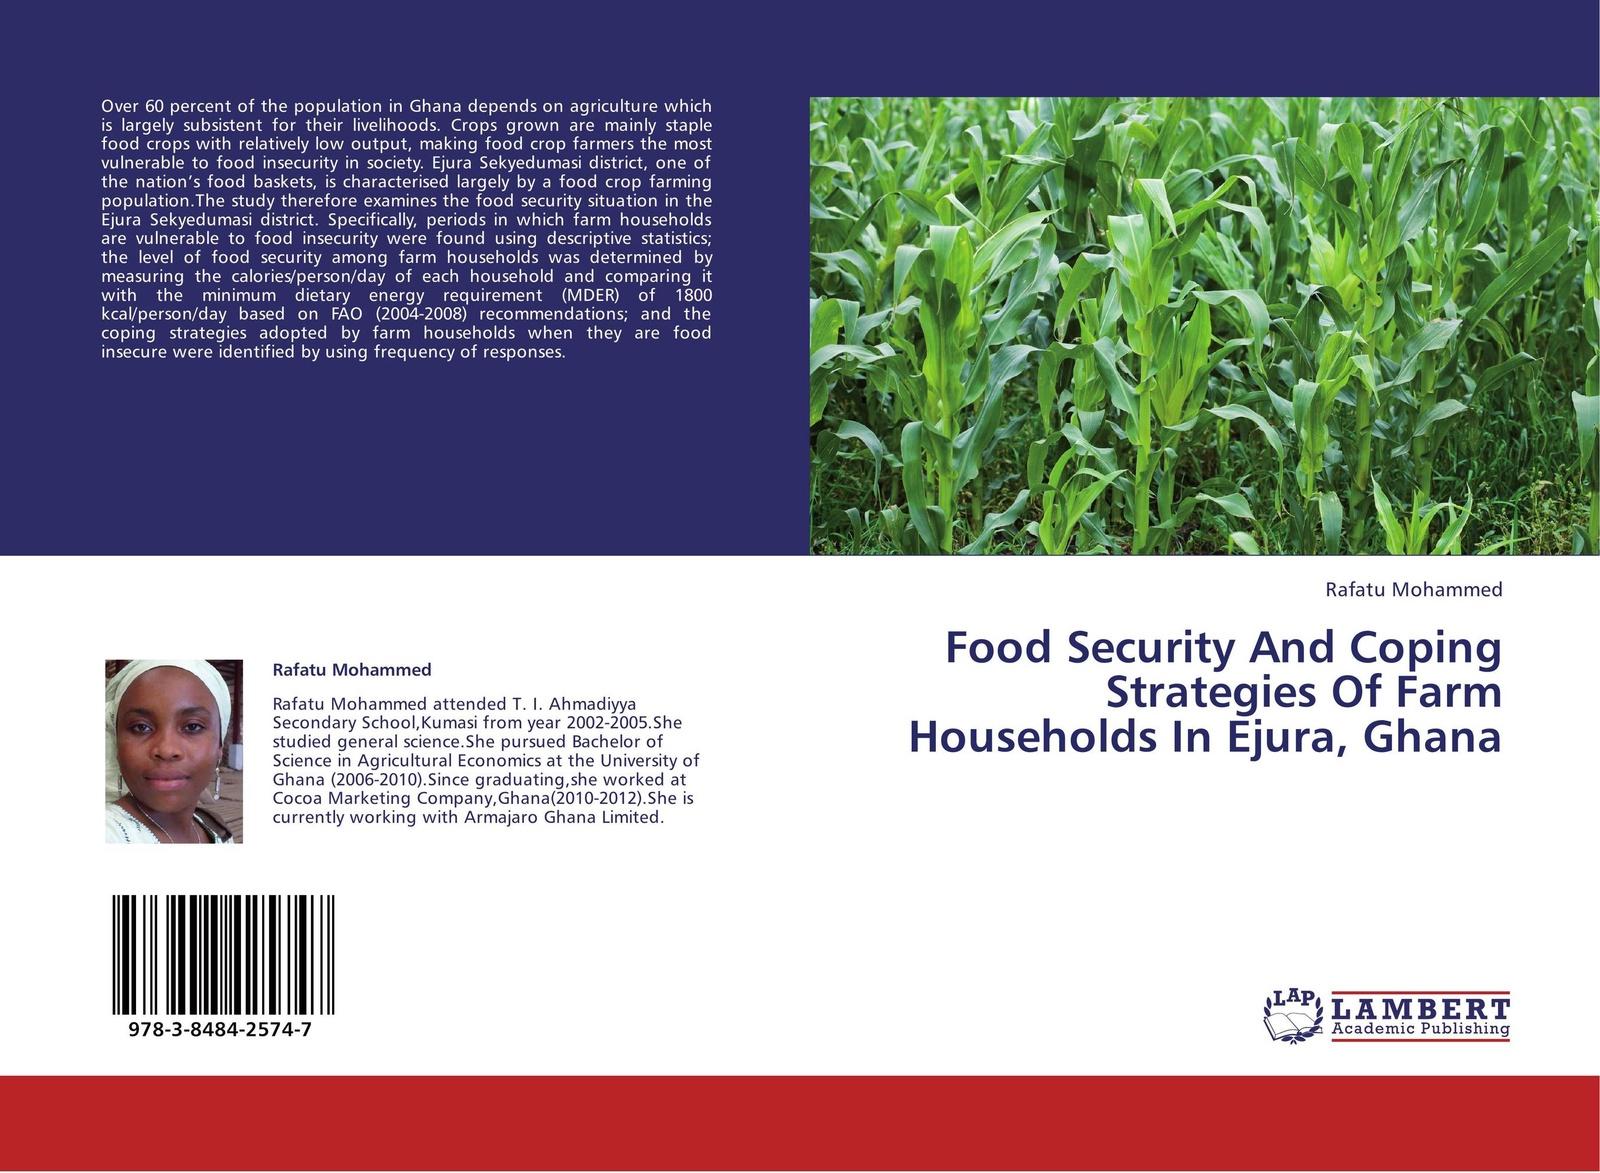 Rafatu Mohammed Food Security And Coping Strategies Of Farm Households In Ejura, Ghana women s indigenous knowledge in household food security